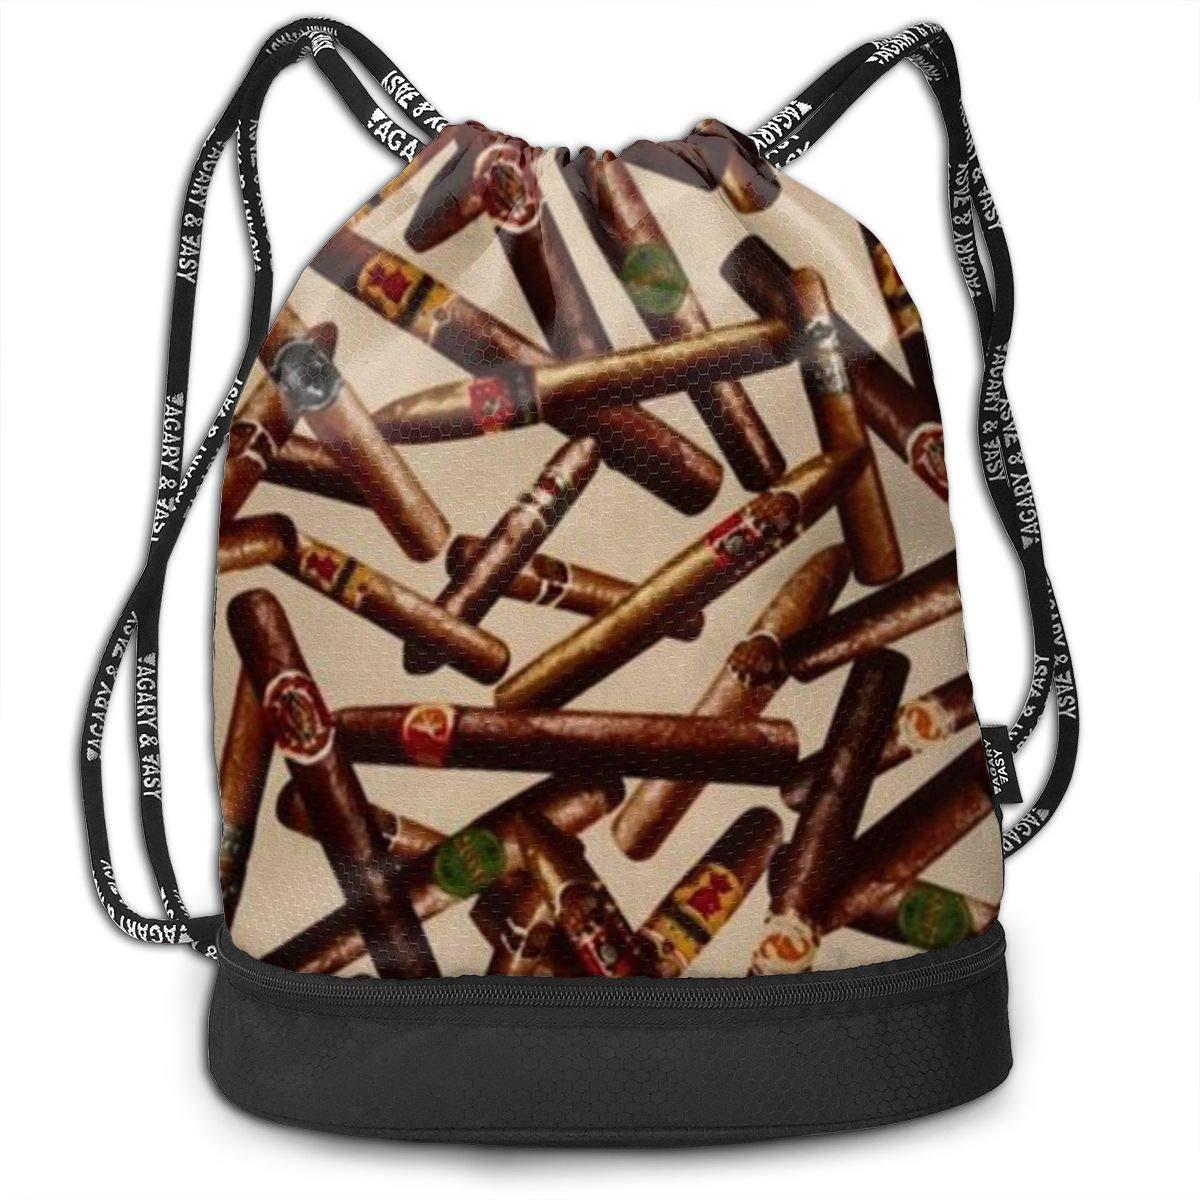 Lightweight Waterproof Large Storage Drawstring Bag For Men /& Women Cigars Pattern Cinch Backpack Sackpack Tote Sack